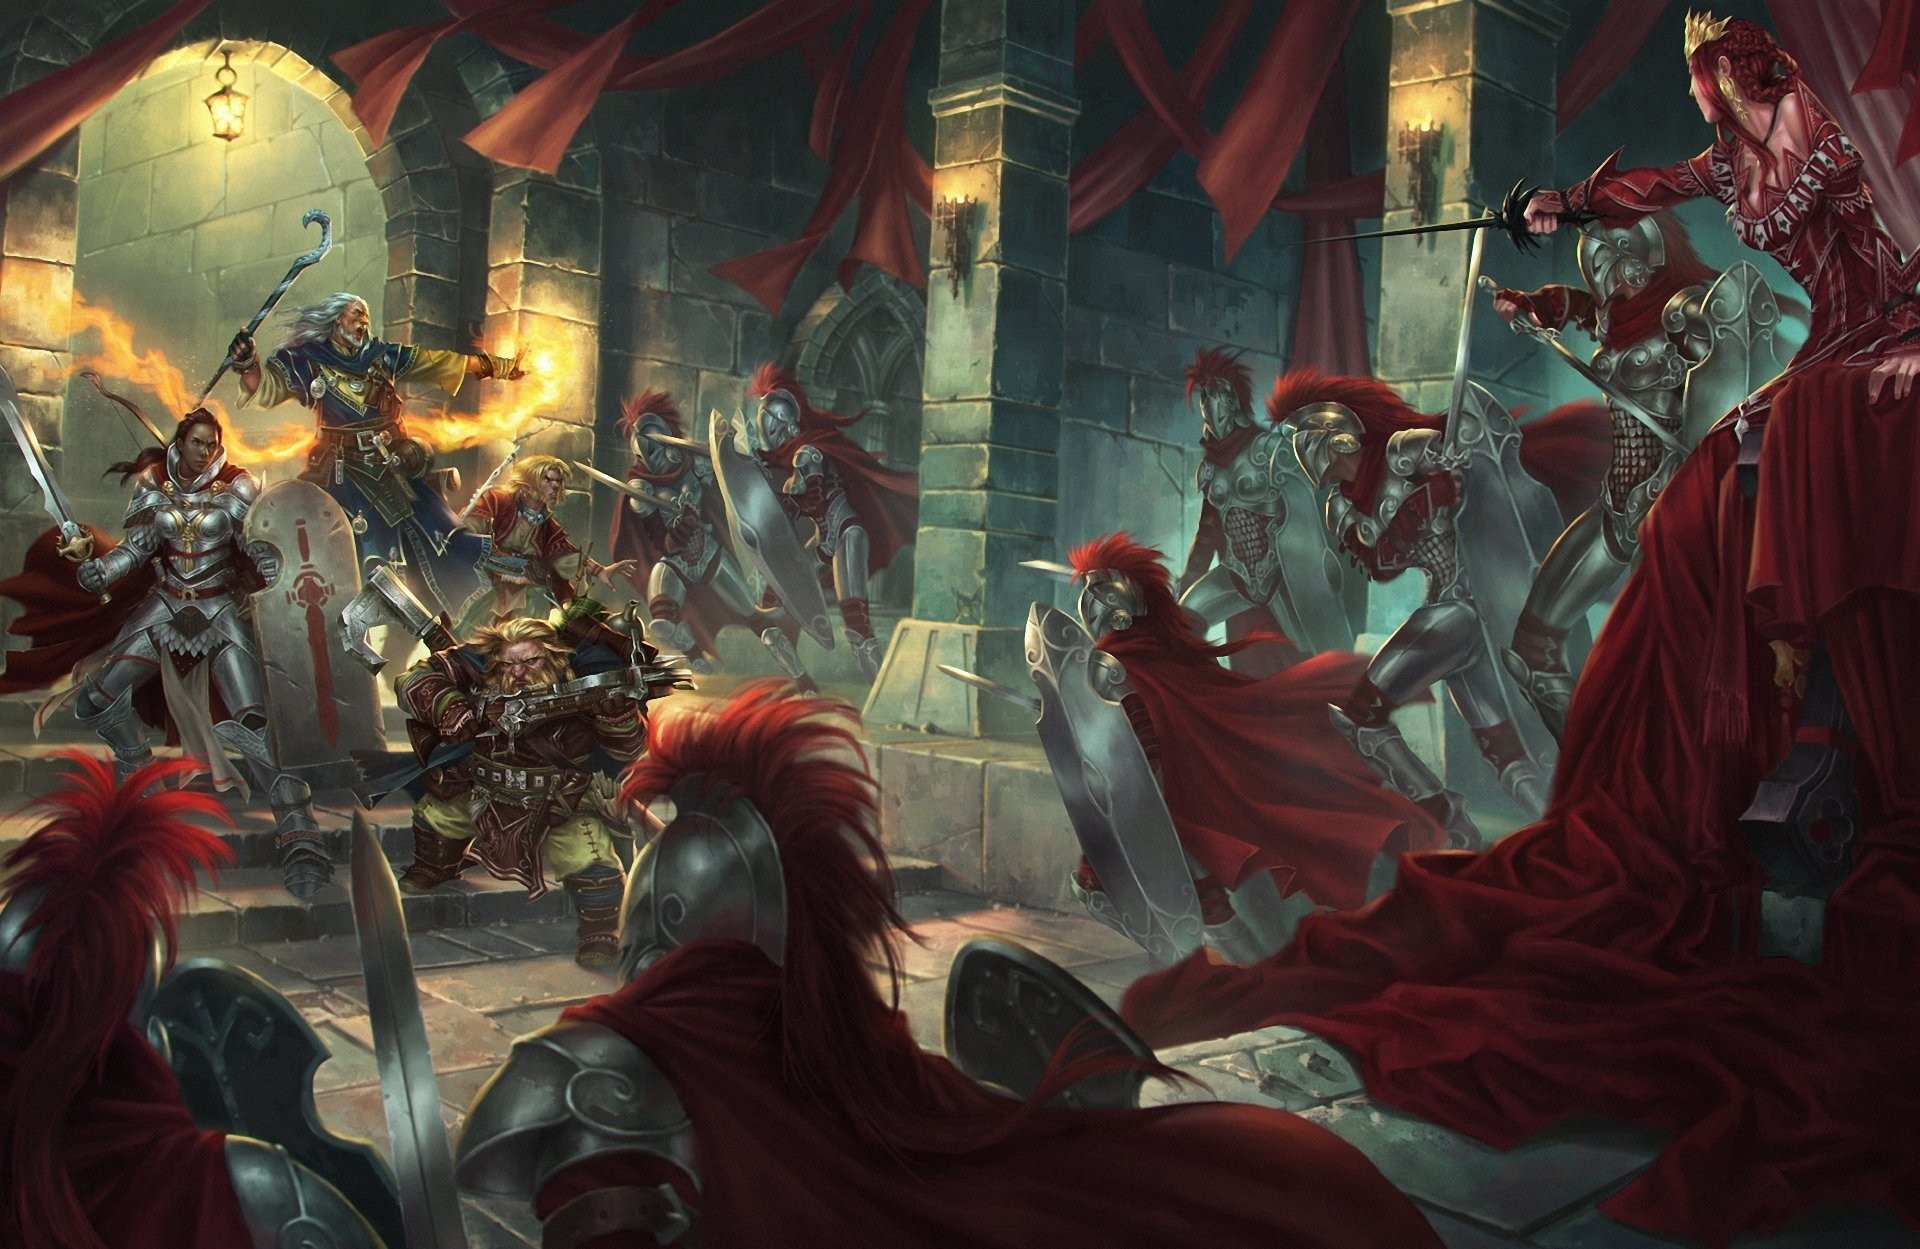 Fantasy – Battle Woman Warrior Knight Sword Dwarf Wizard Wallpaper